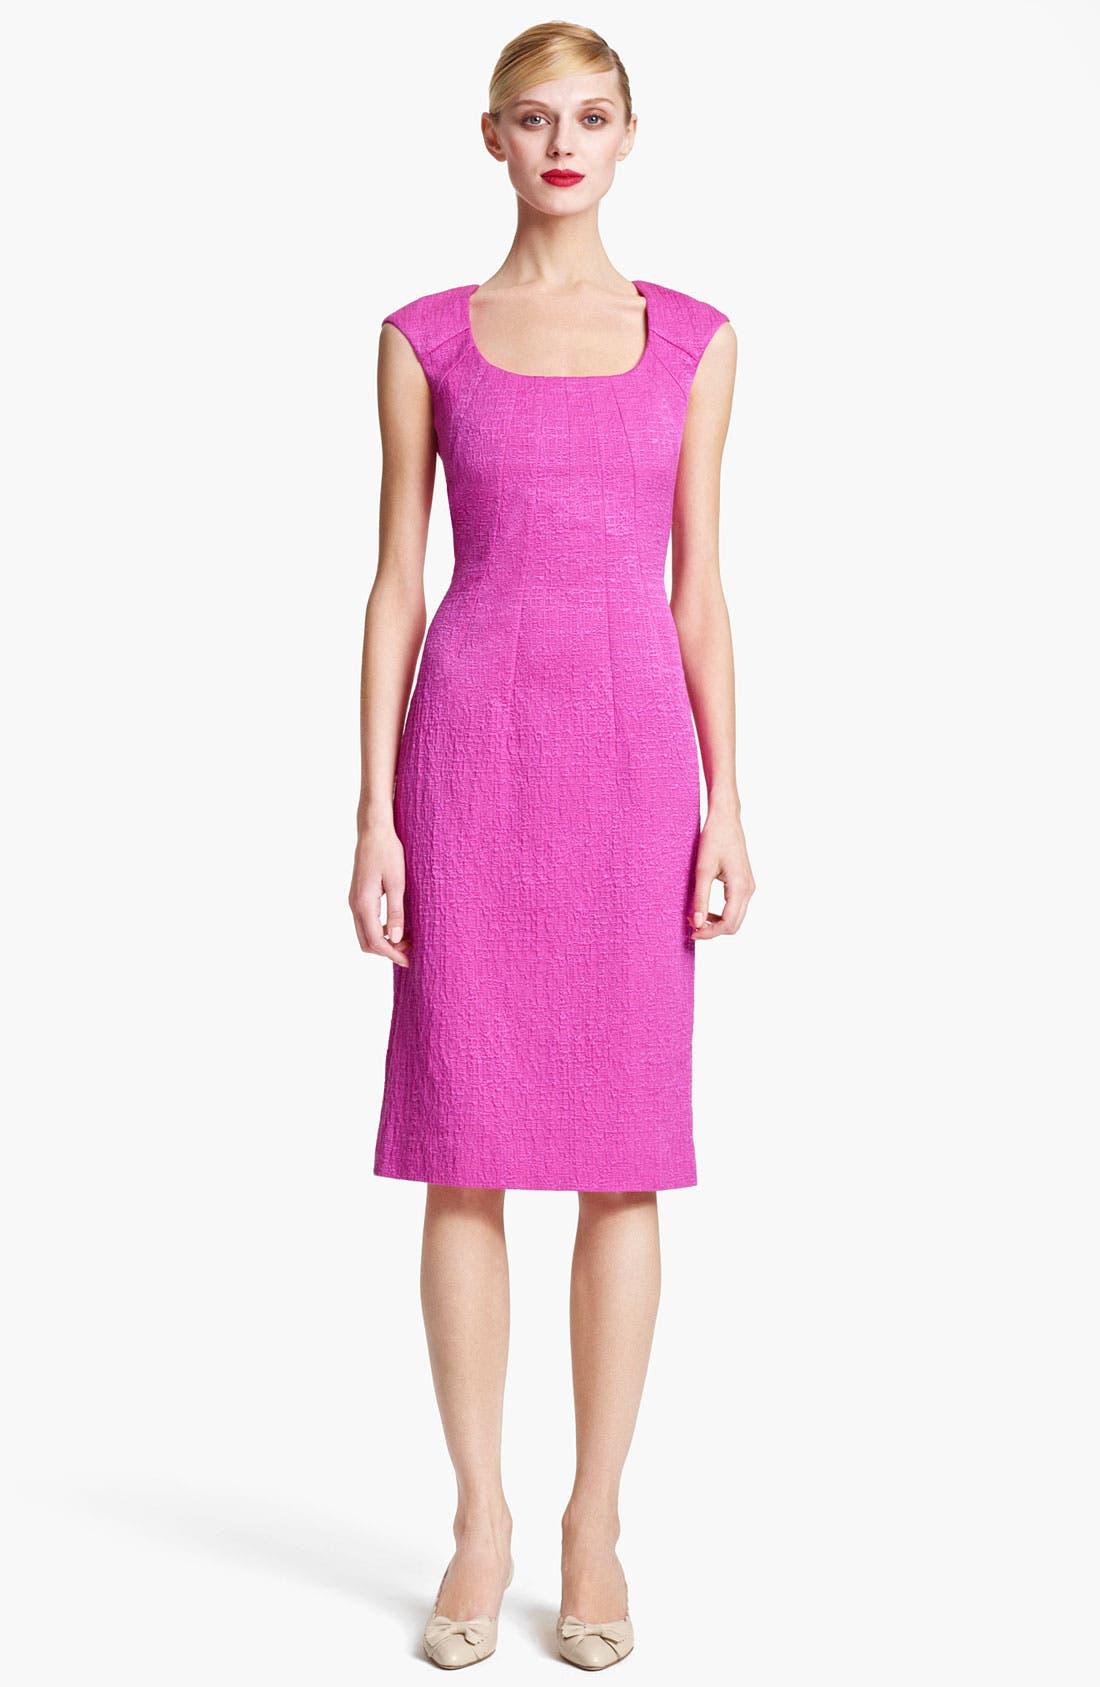 Alternate Image 1 Selected - Oscar de la Renta Belted Crimped Cotton & Silk Dress